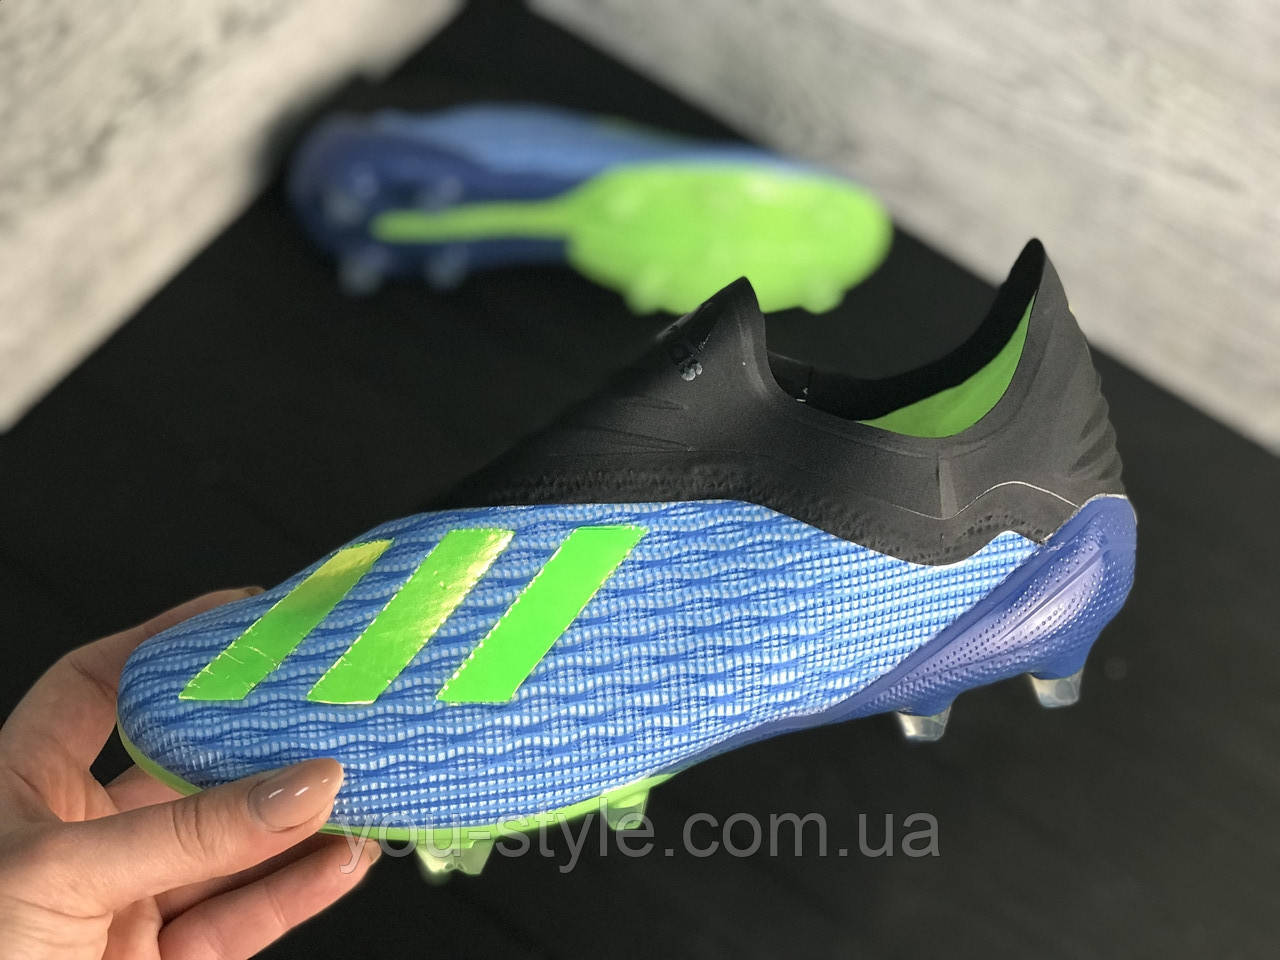 Бутсы Adidas X 18.1 / копы адидас/без шнурков